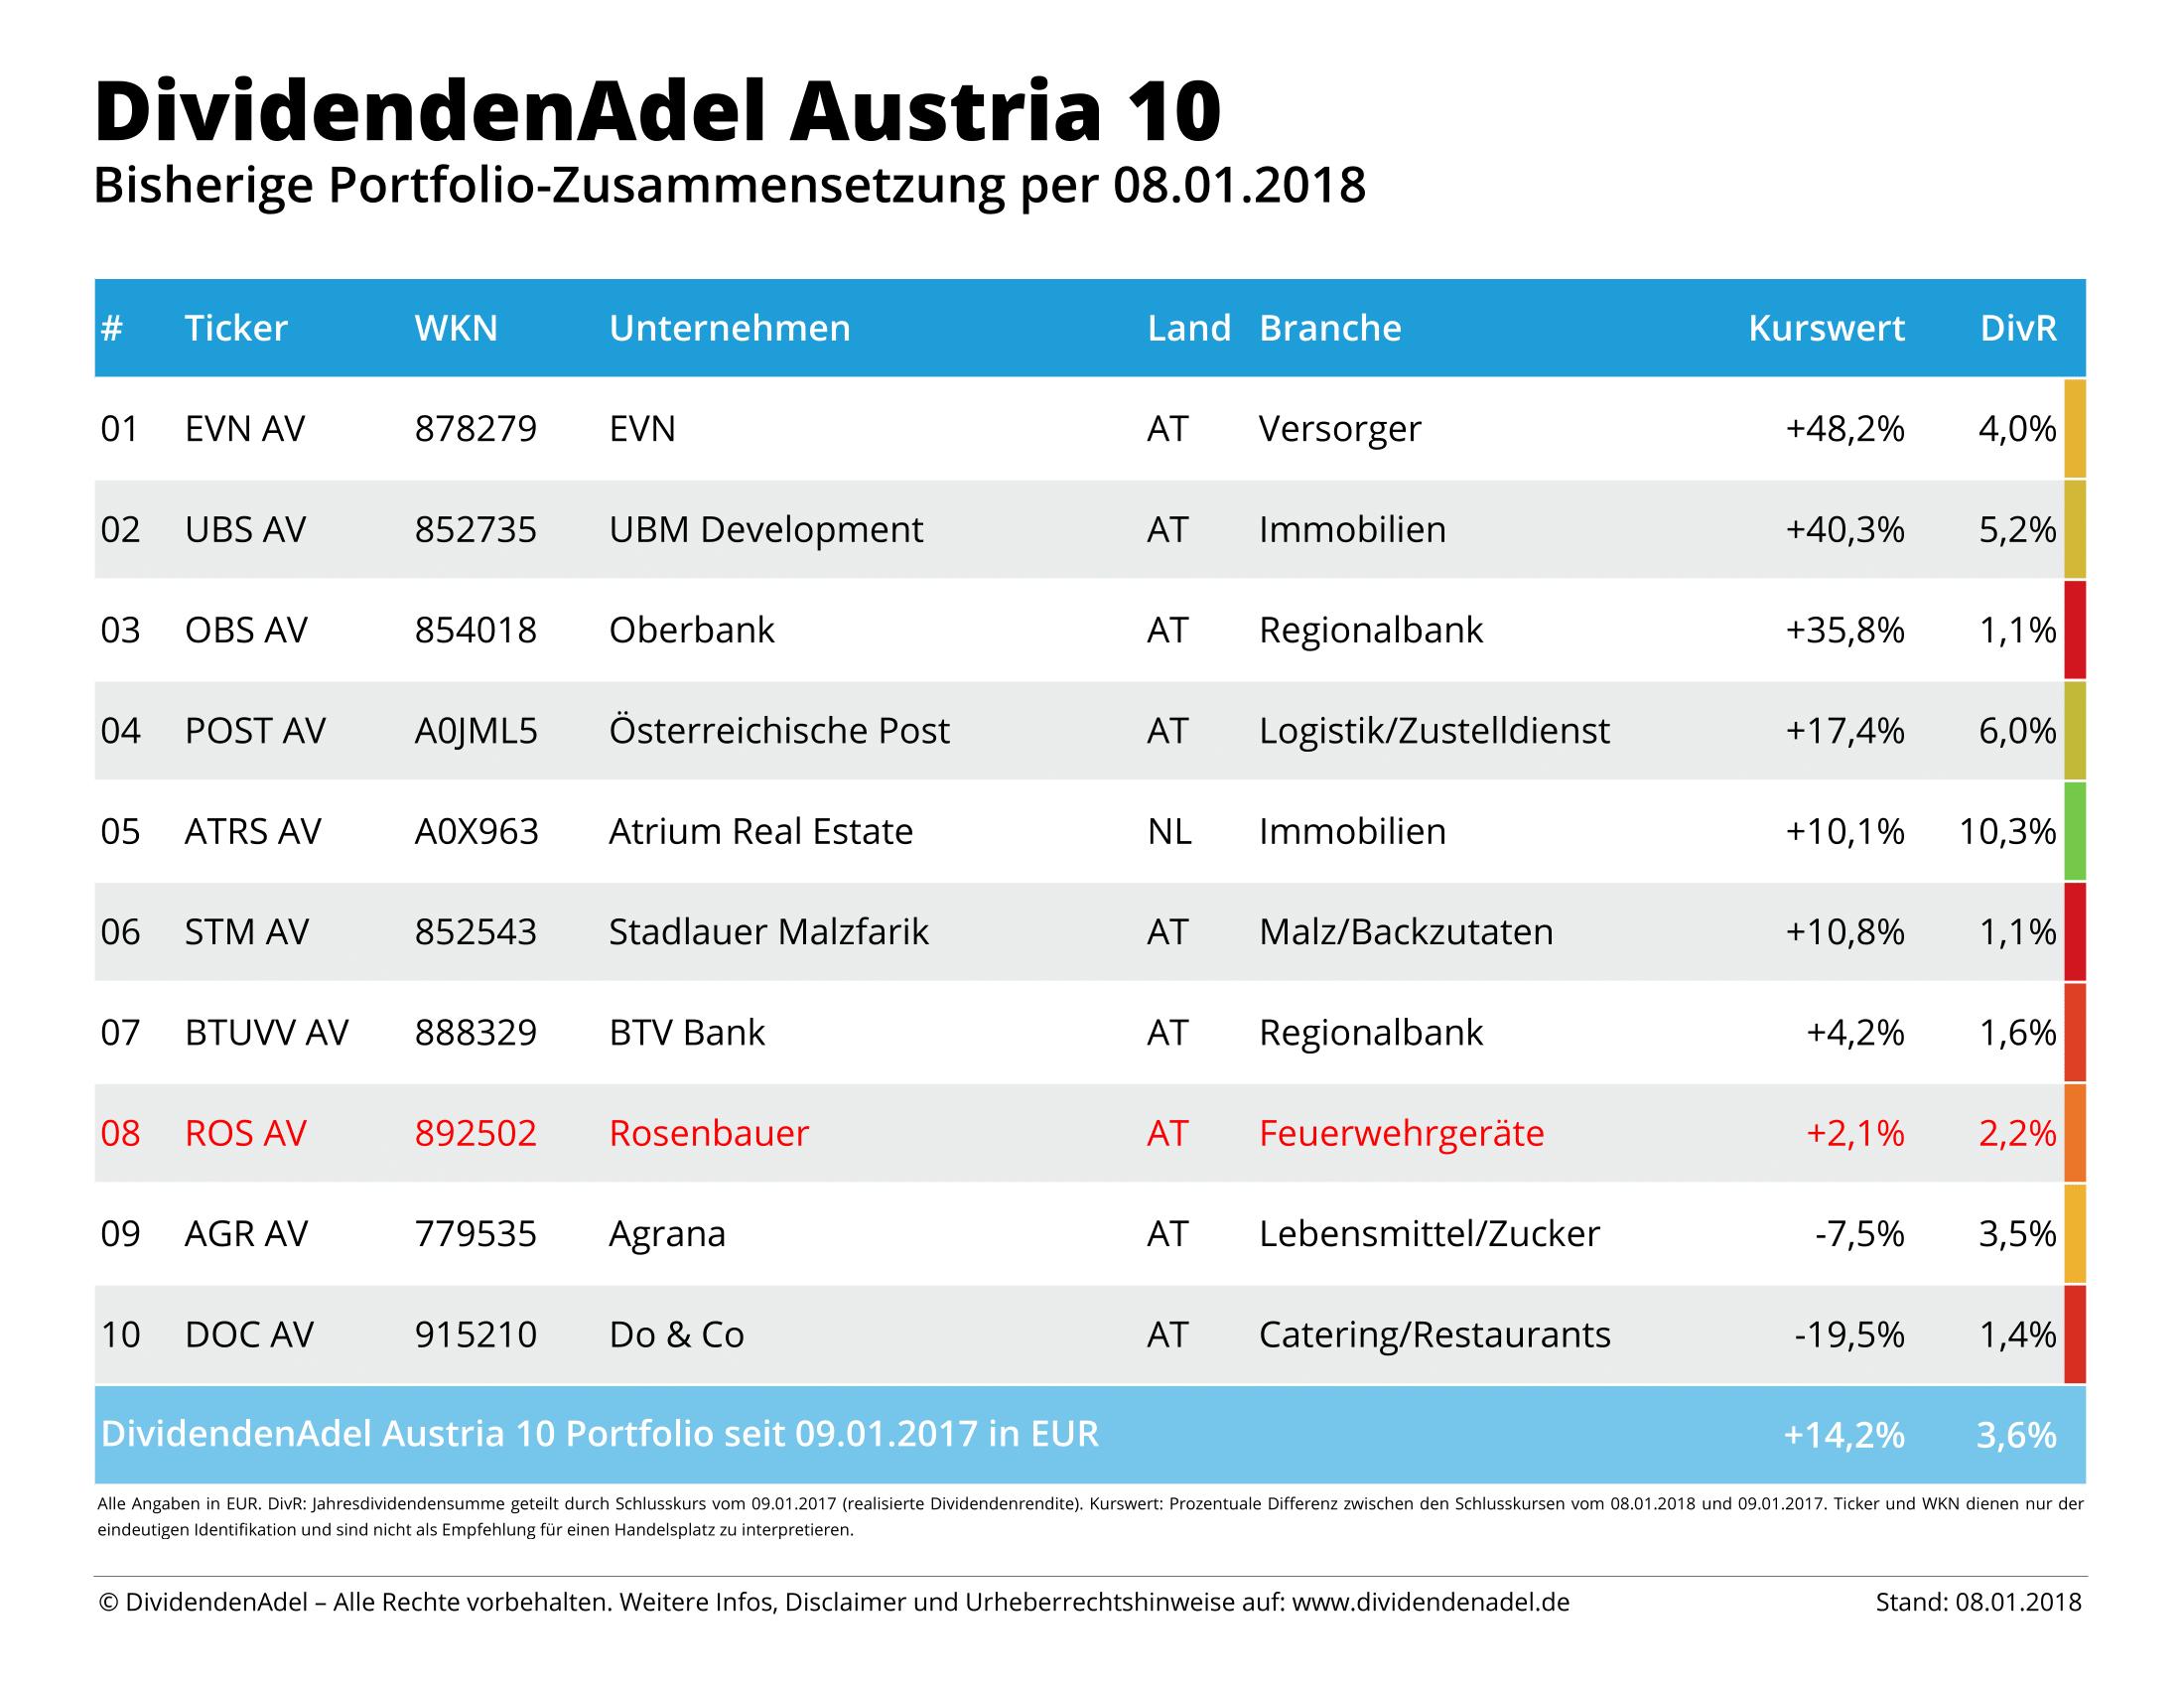 2018-01-08-OP-DividendenAdel-Austria-10